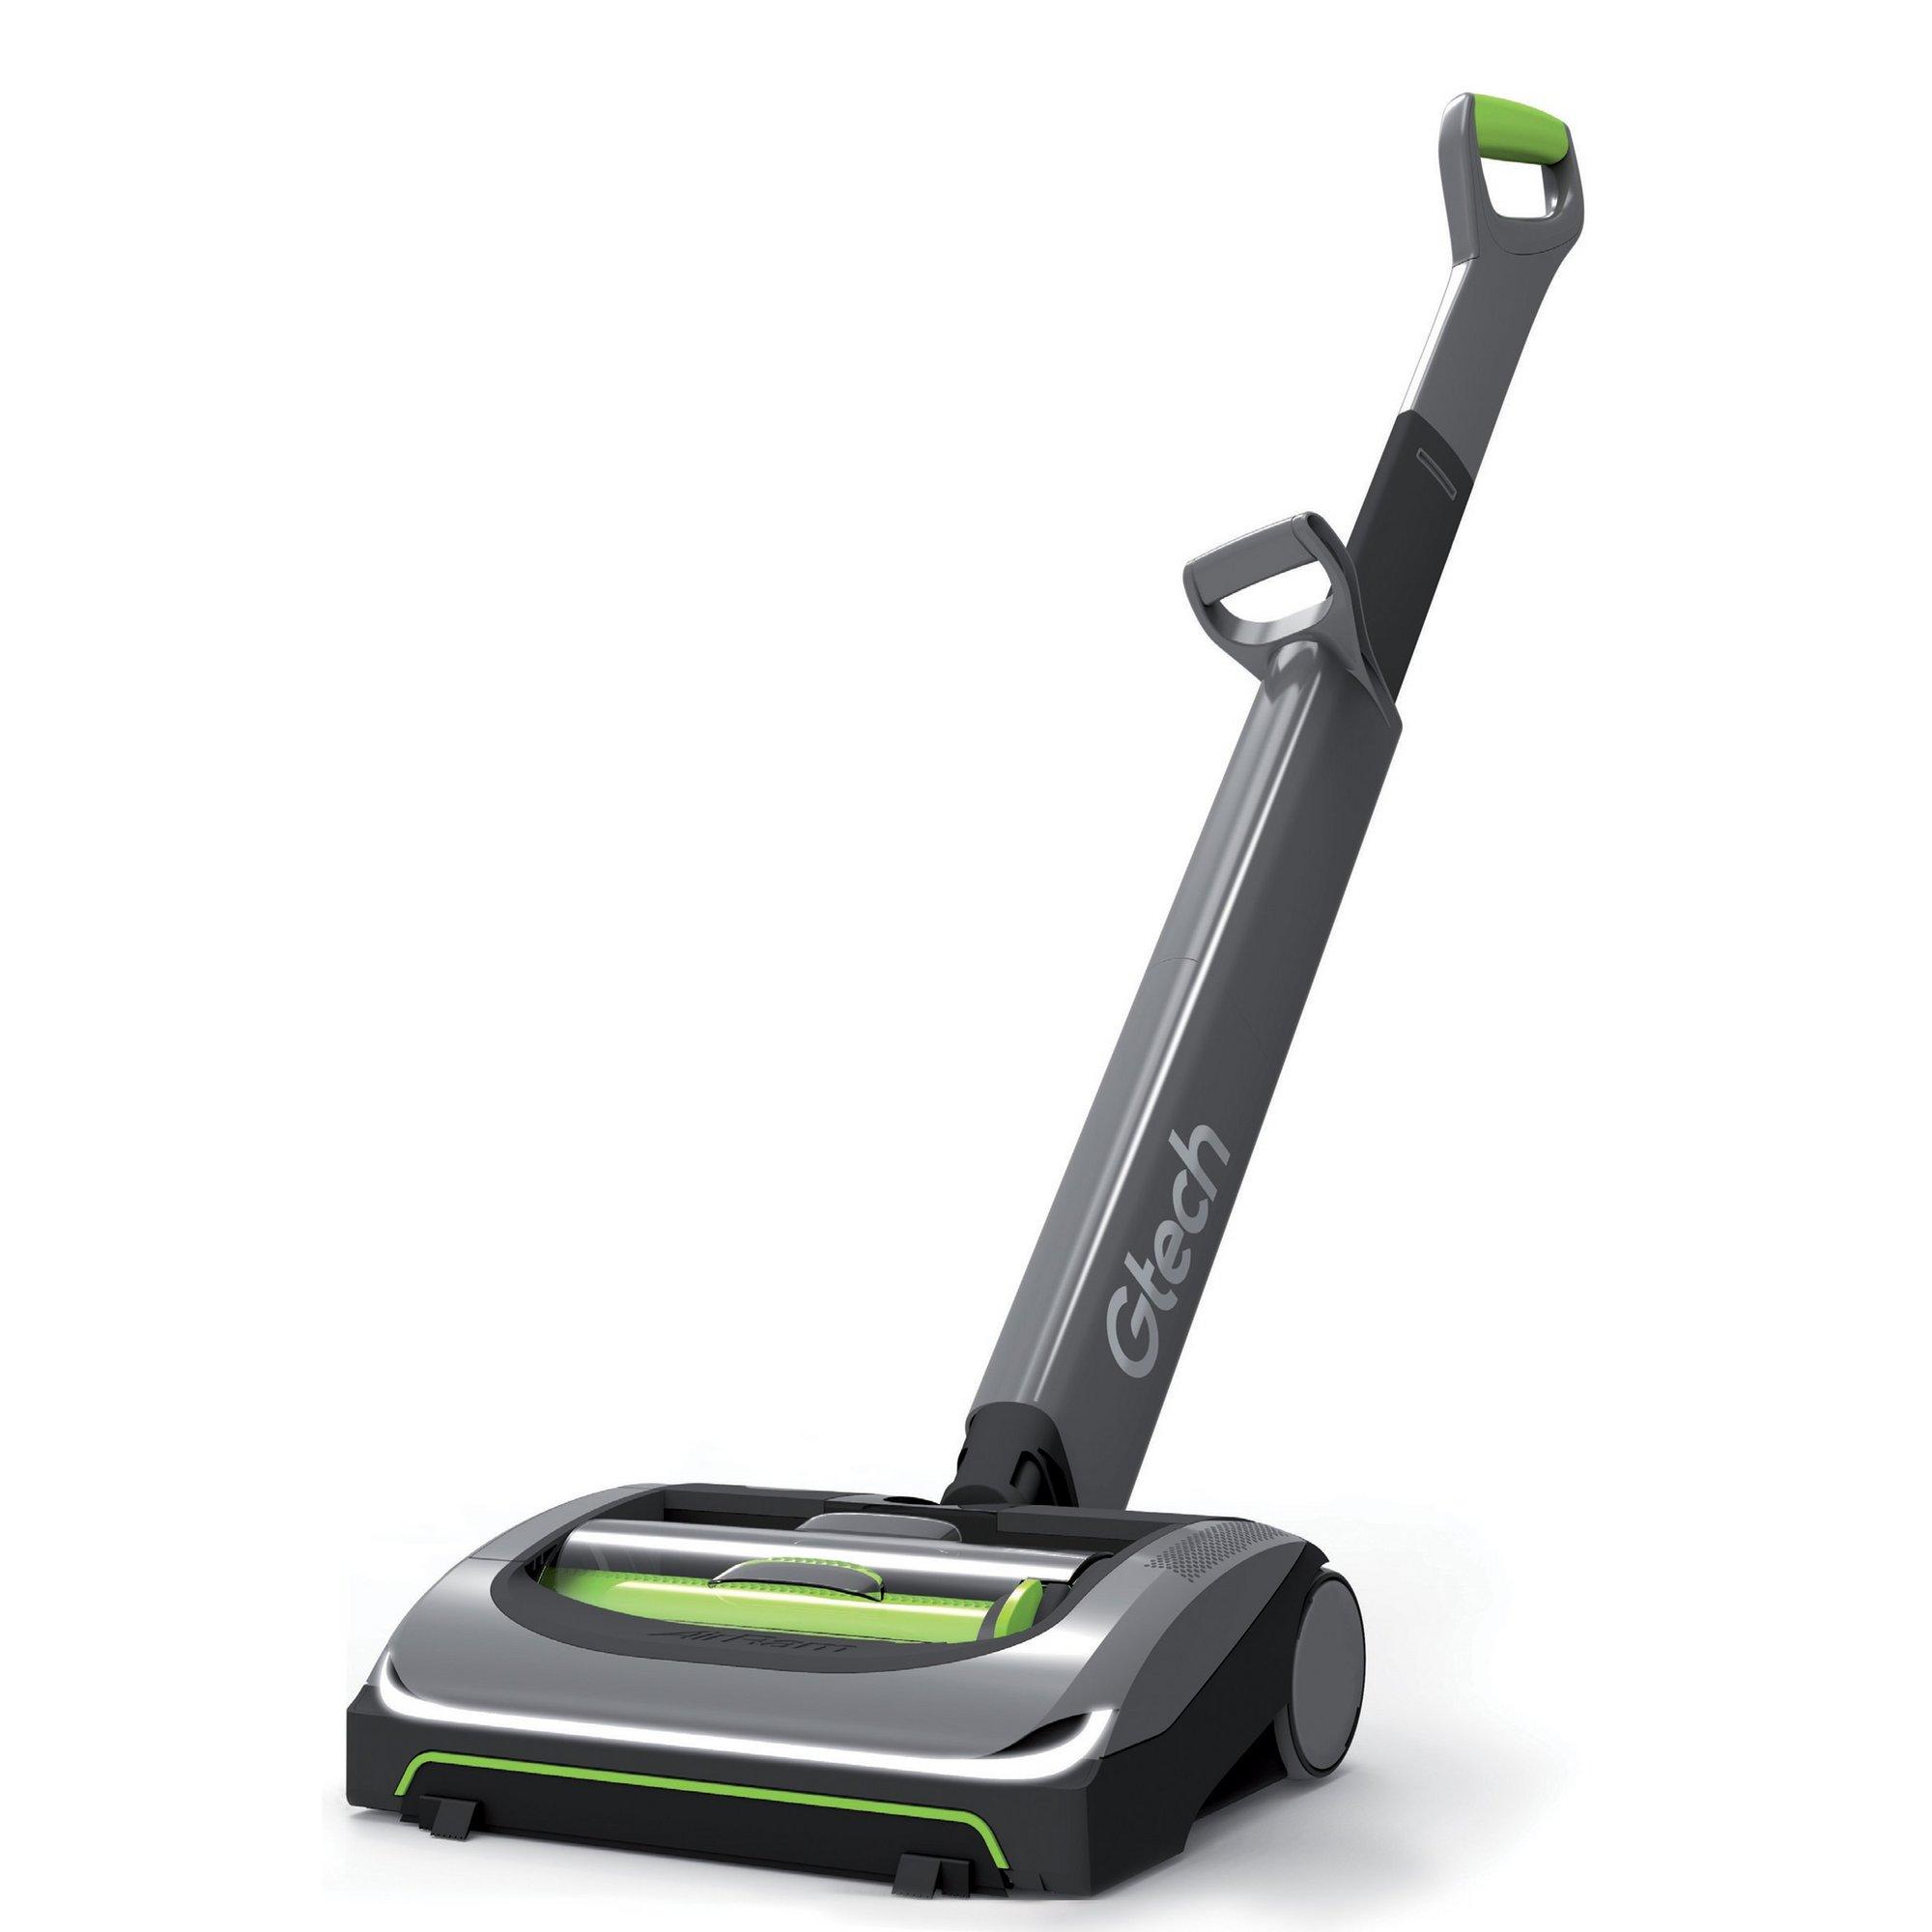 Image of Gtech AirRam MK2 Cordless Vacuum